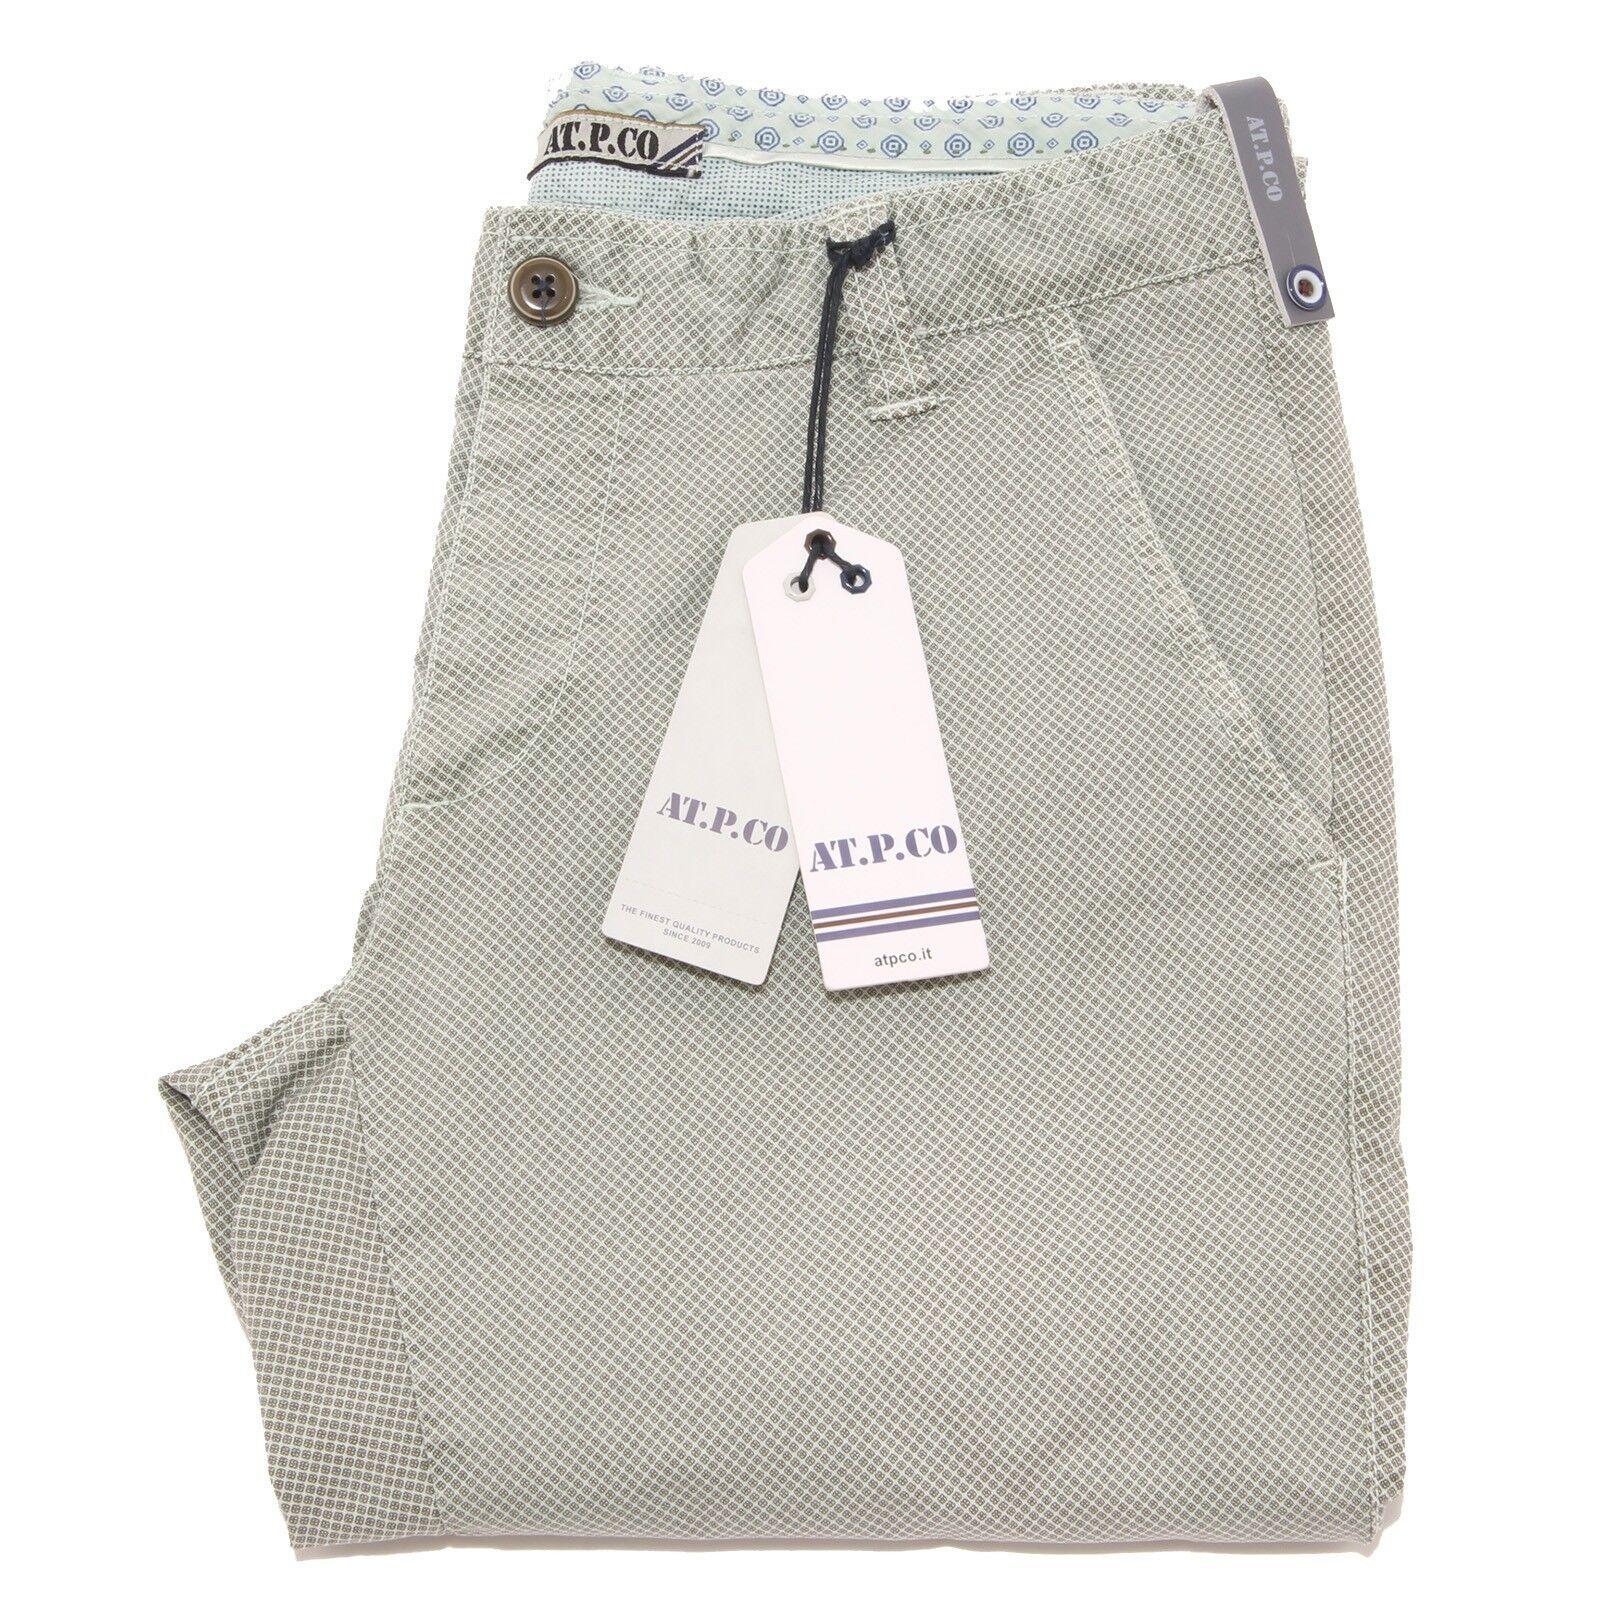 5913P pantalone AT.P.CO. FEDE verde grigio jeans uomo uomo uomo pant men 9907e5